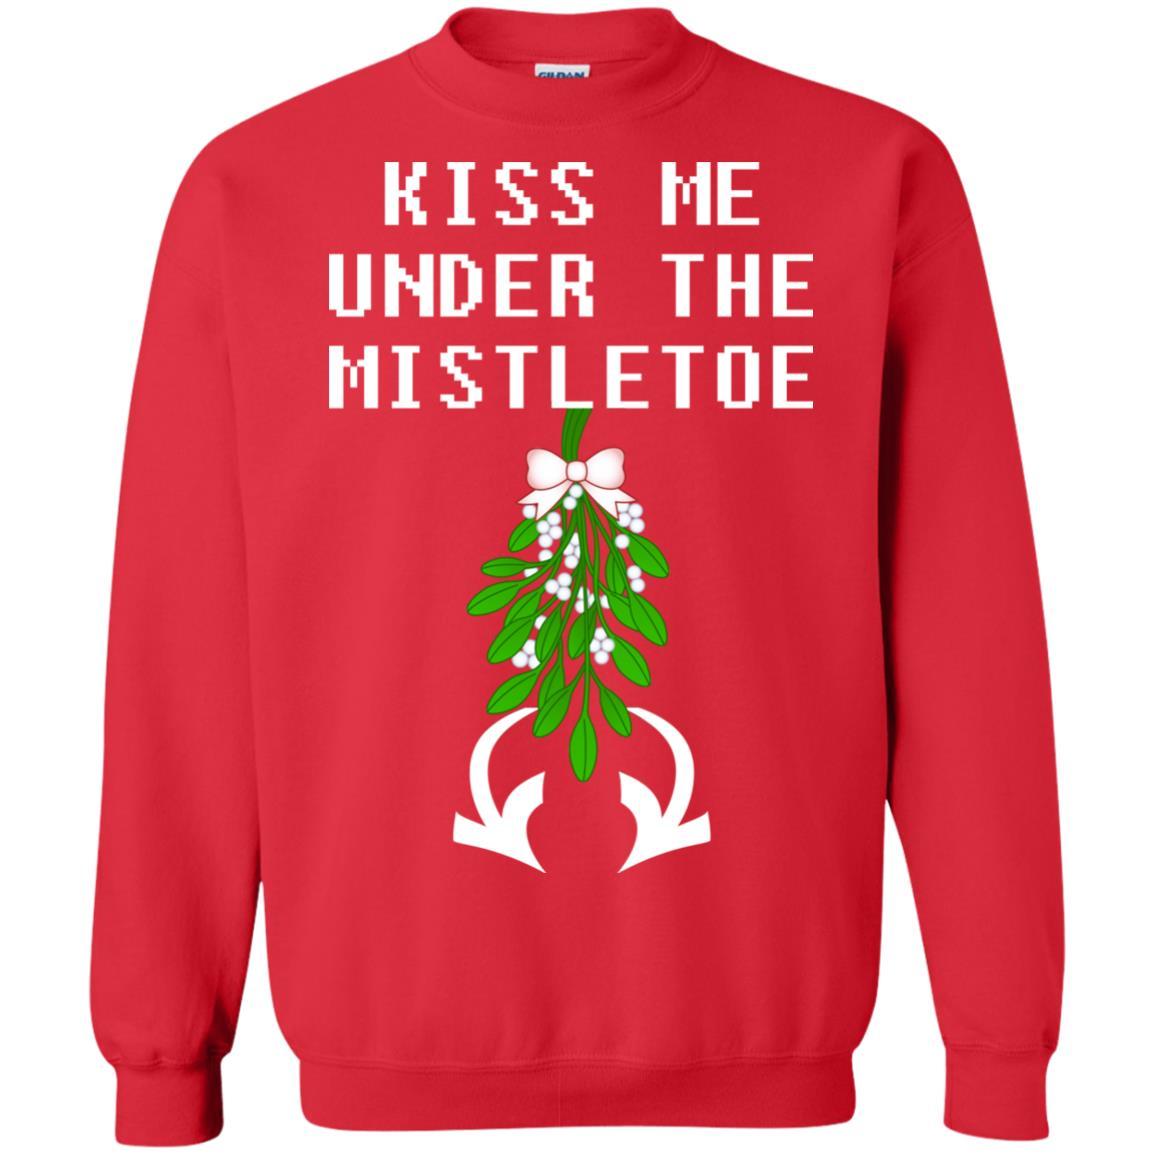 Kiss Me Under The Mistletoe Christmas Sweater, Hoodie - Rockatee